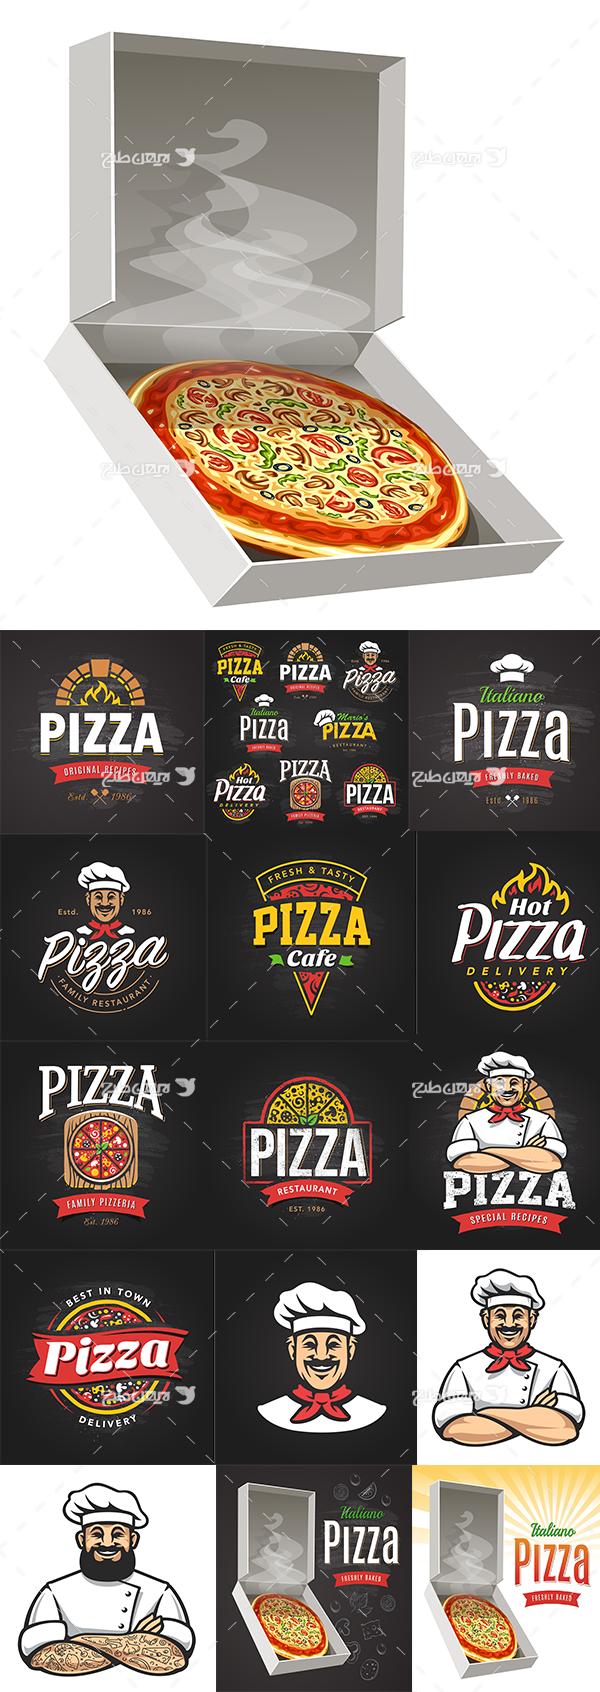 لوگو با طرح پیتزا